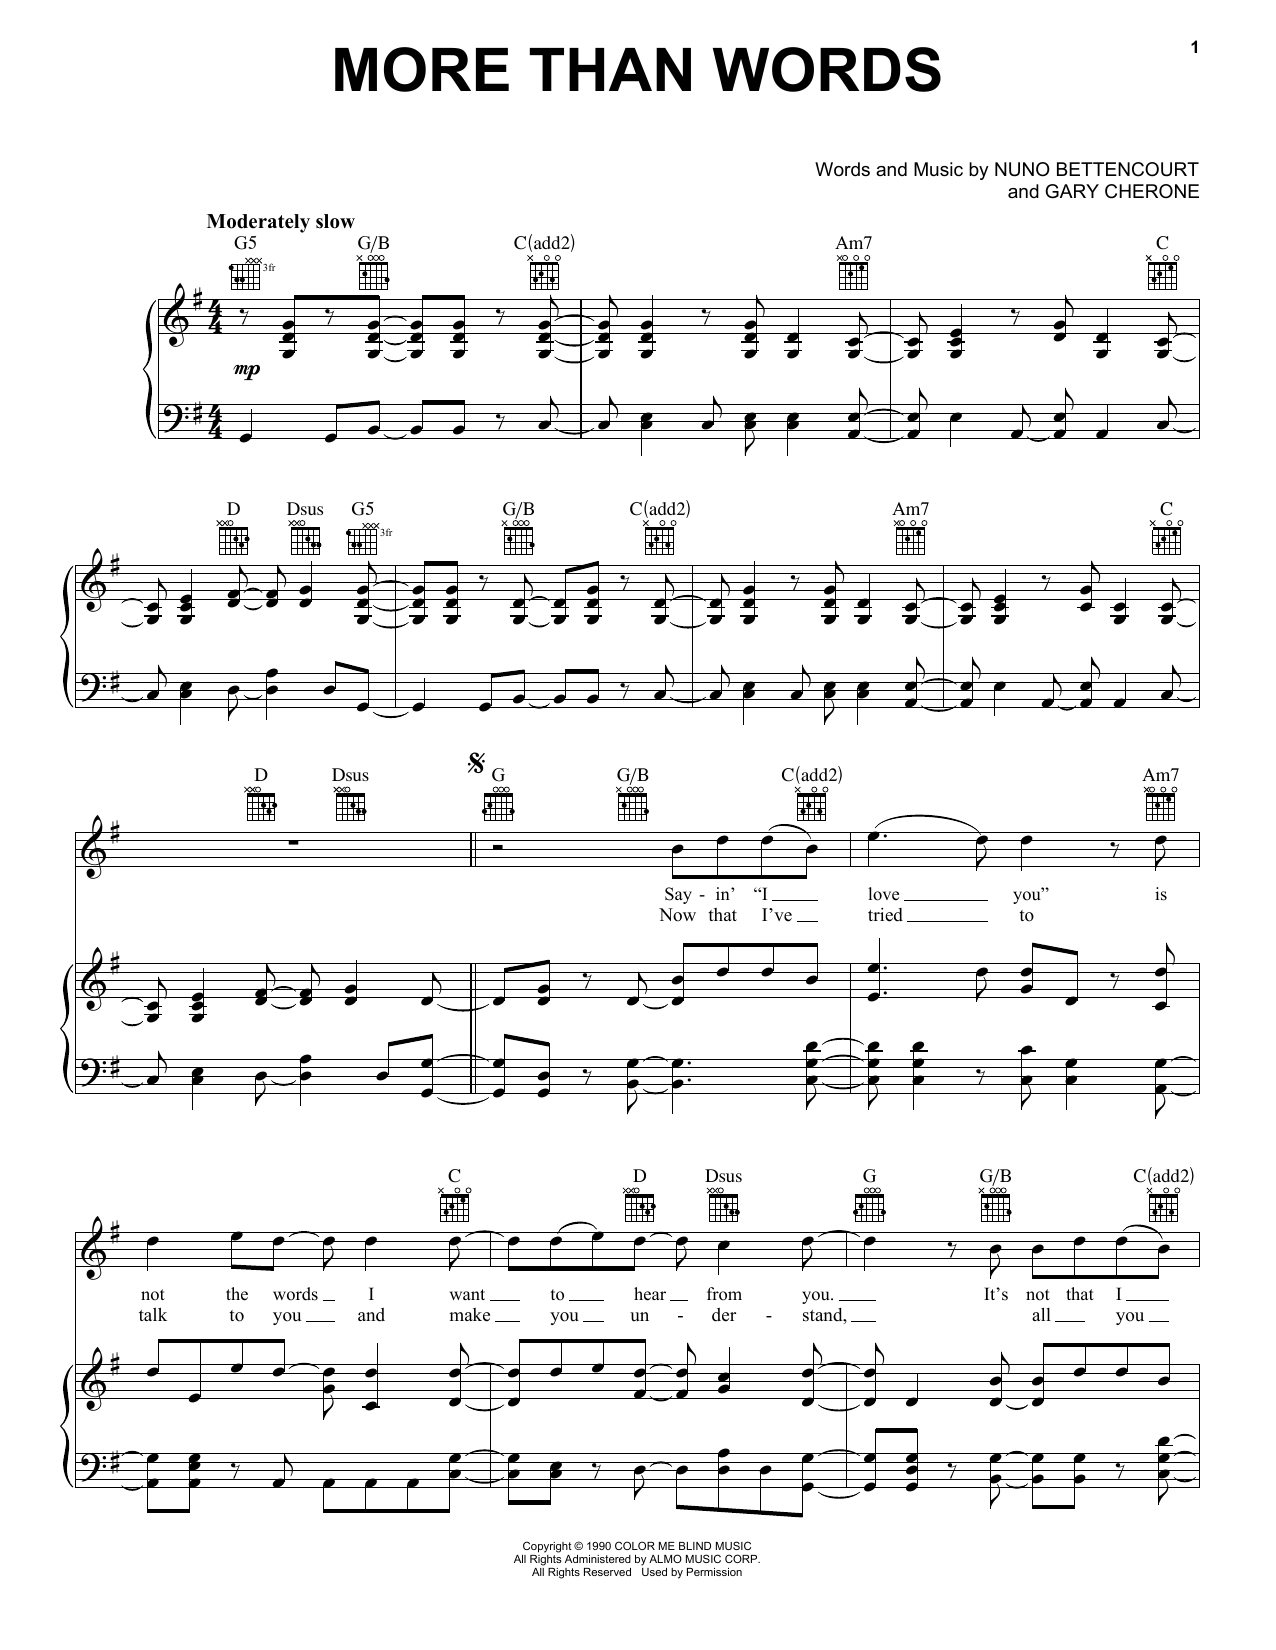 More Than Words sheet music